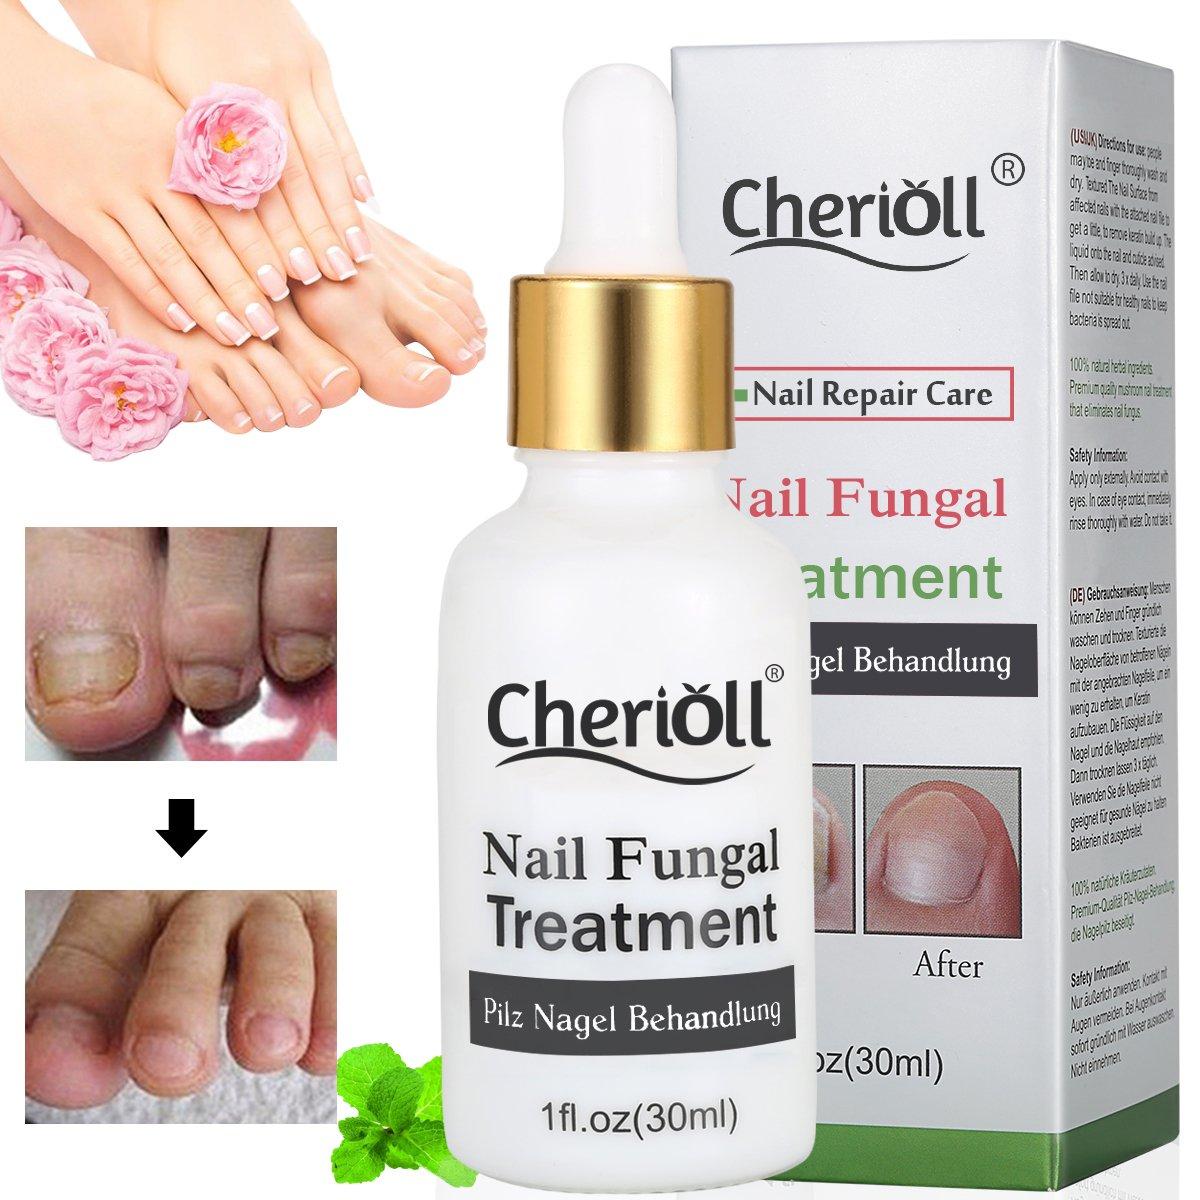 Nagelpilz Öl, Pilz Nagel Behandlung, Anti-Pilz, Natürliche Anti-Pilz ...